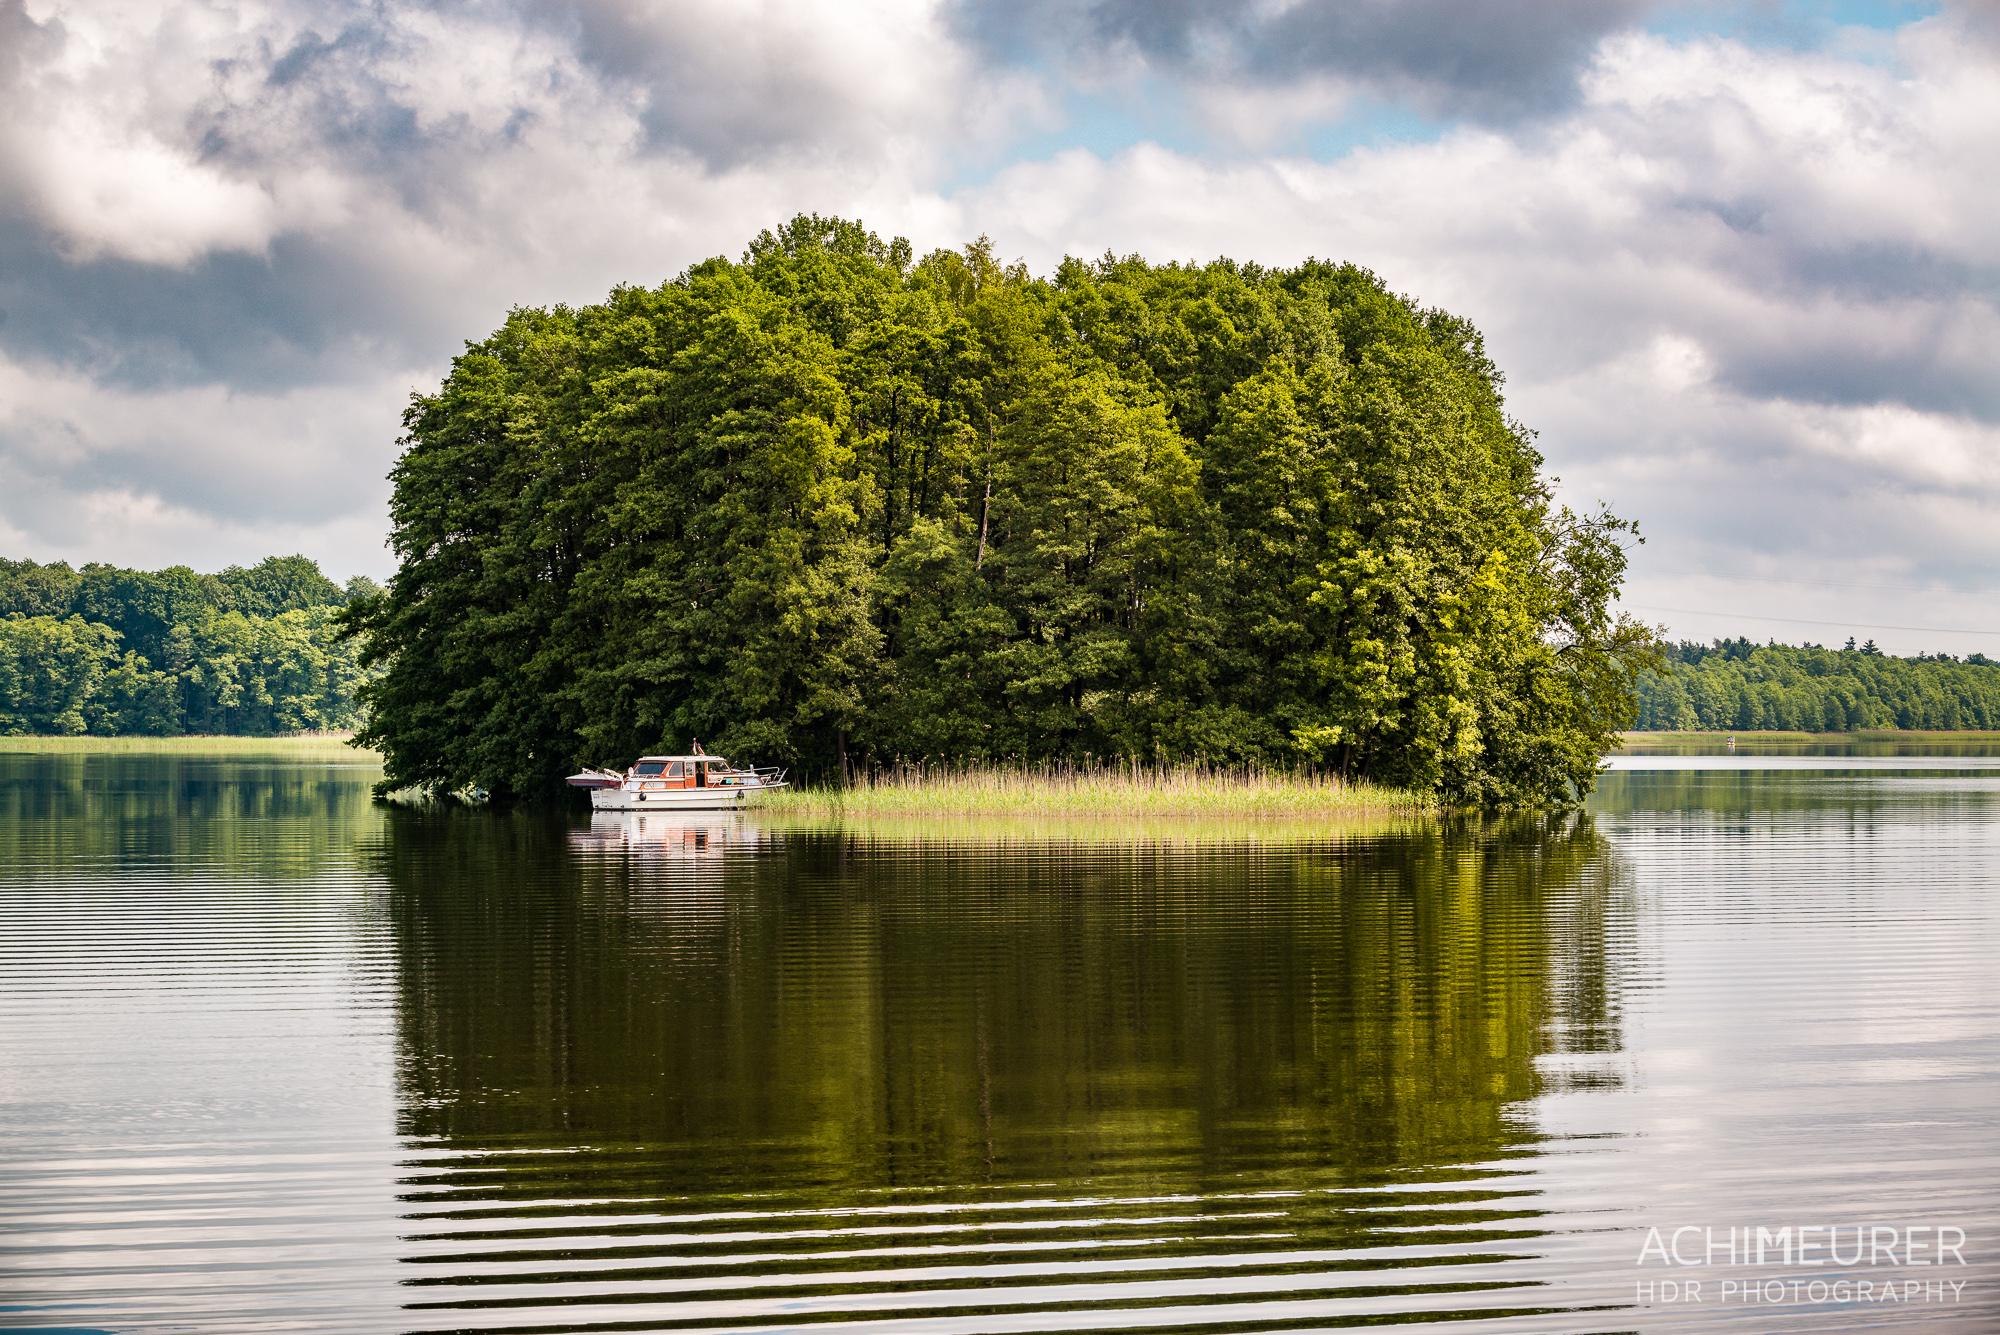 Hausboot-Kuhnle-Mueritz-Mecklenburg-Vorpommern-See_2842